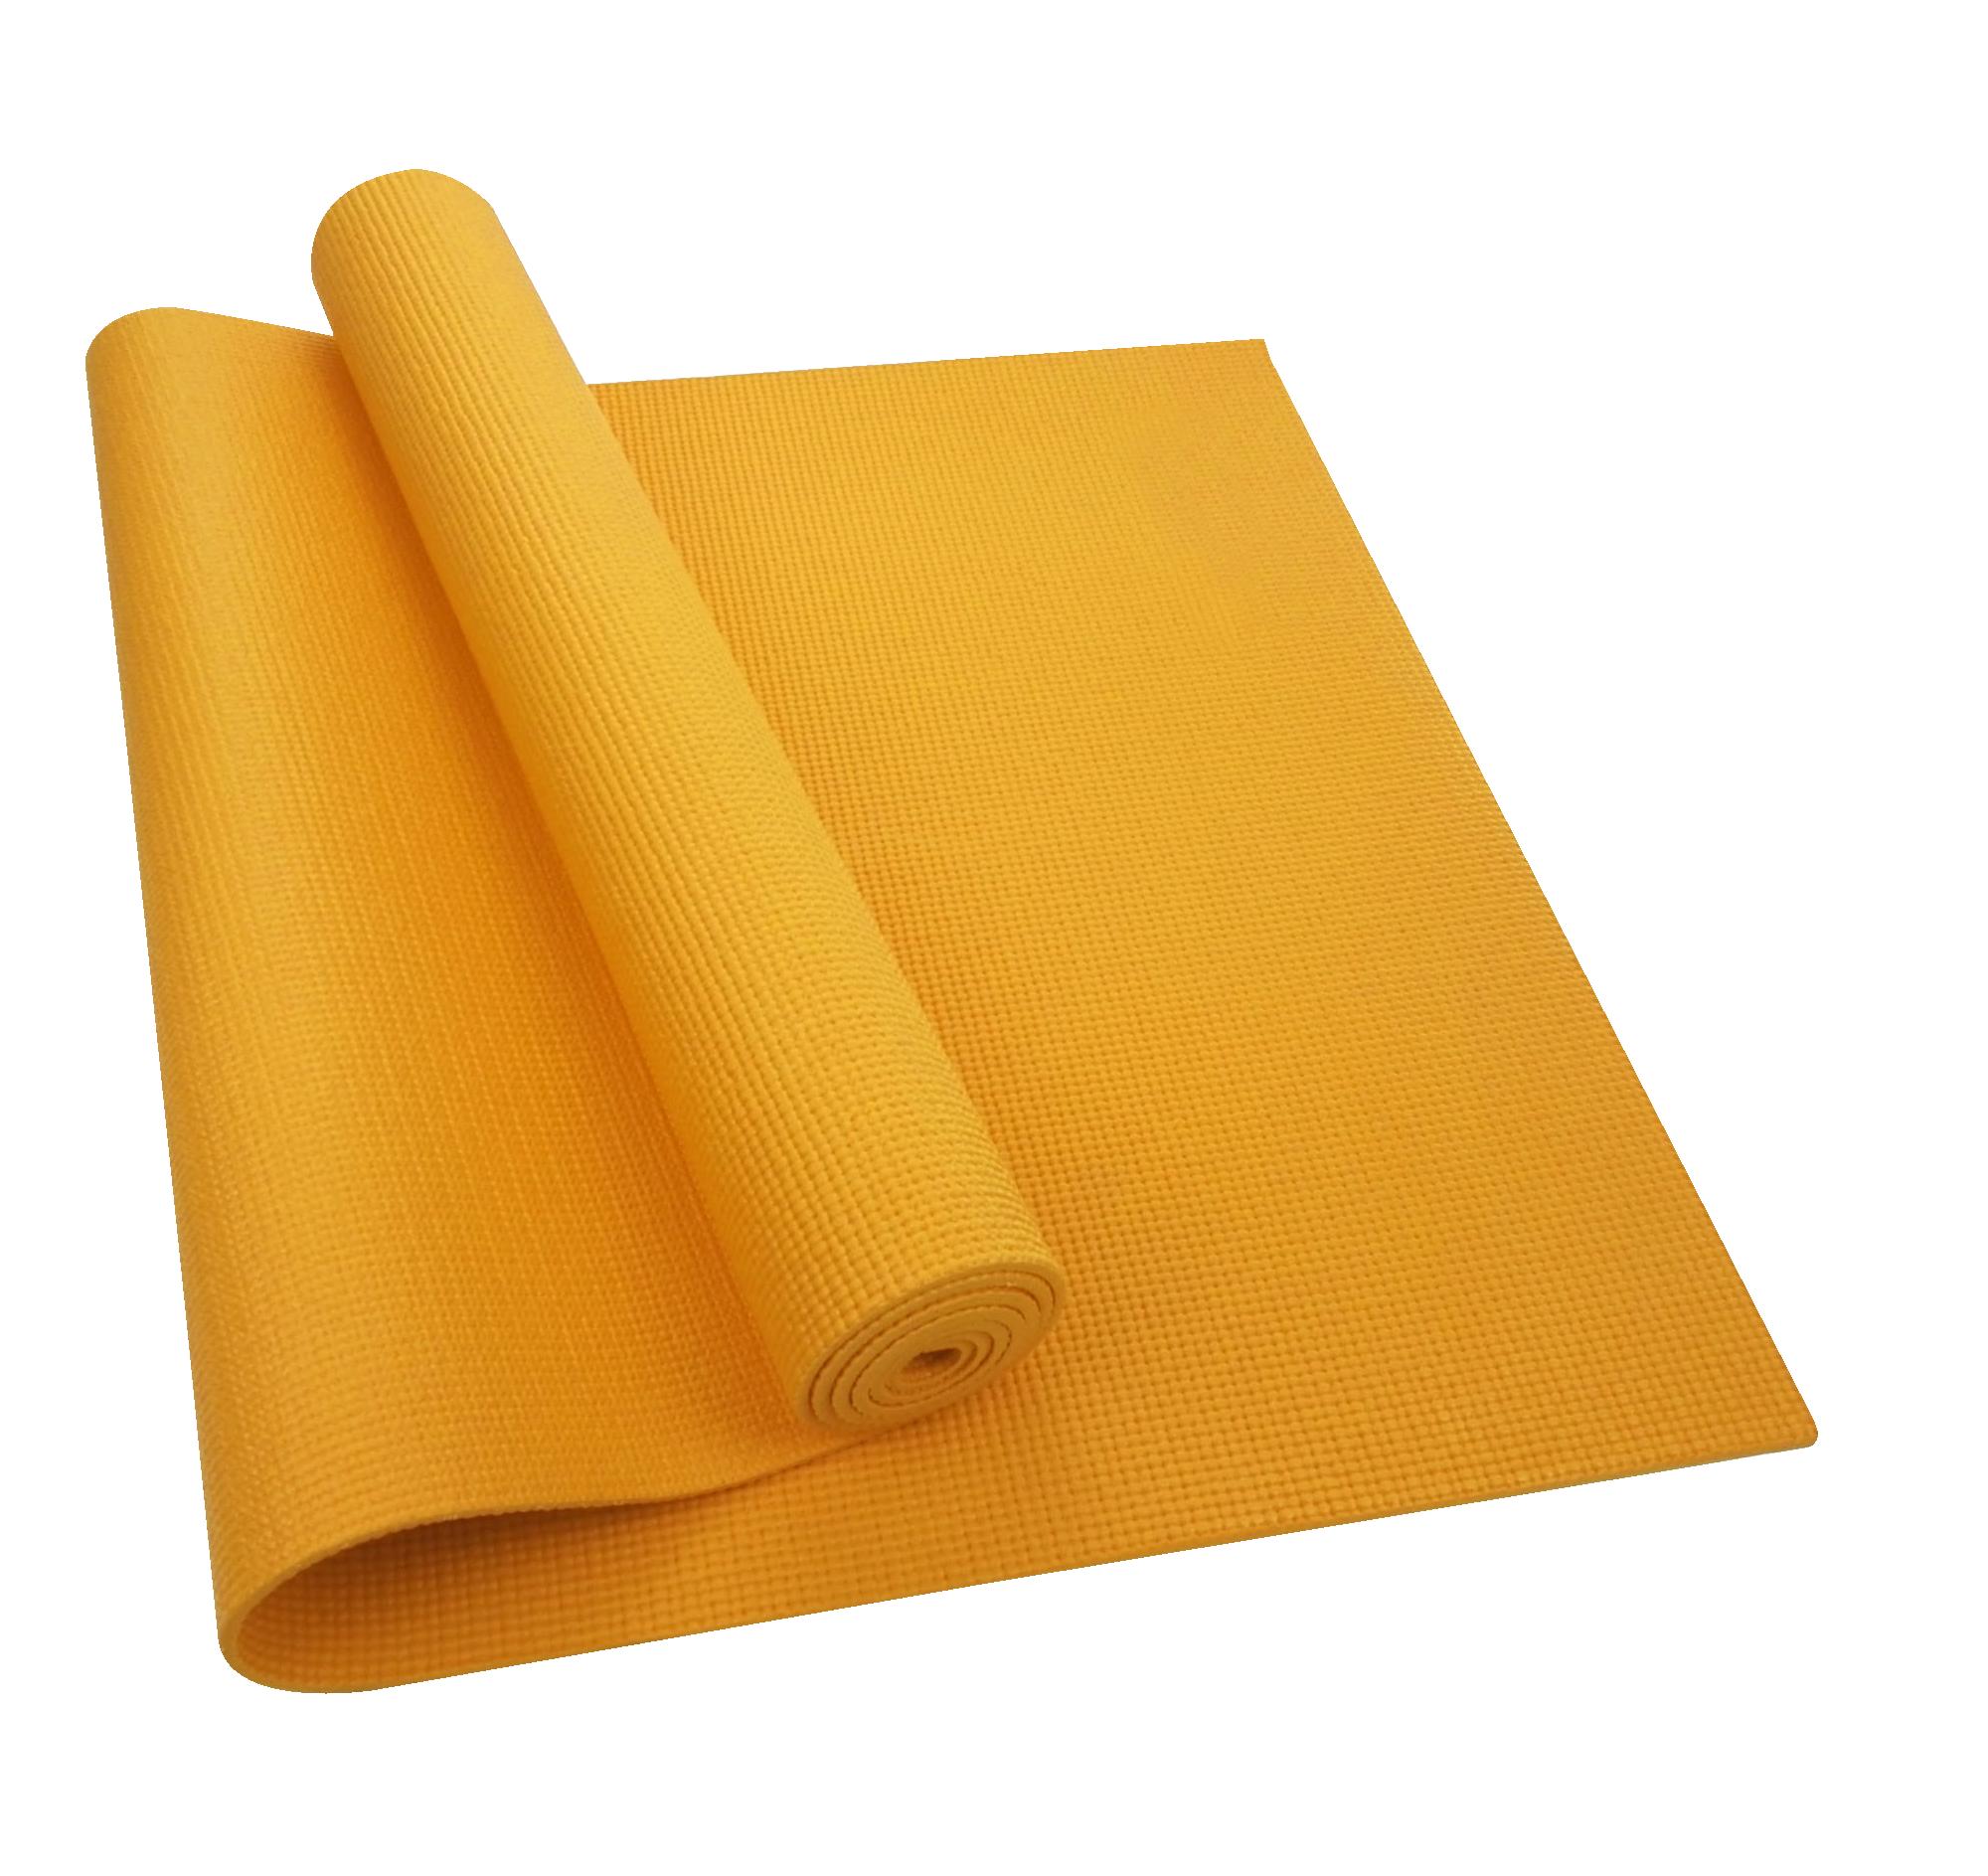 Yoga Mat PNG - 61173